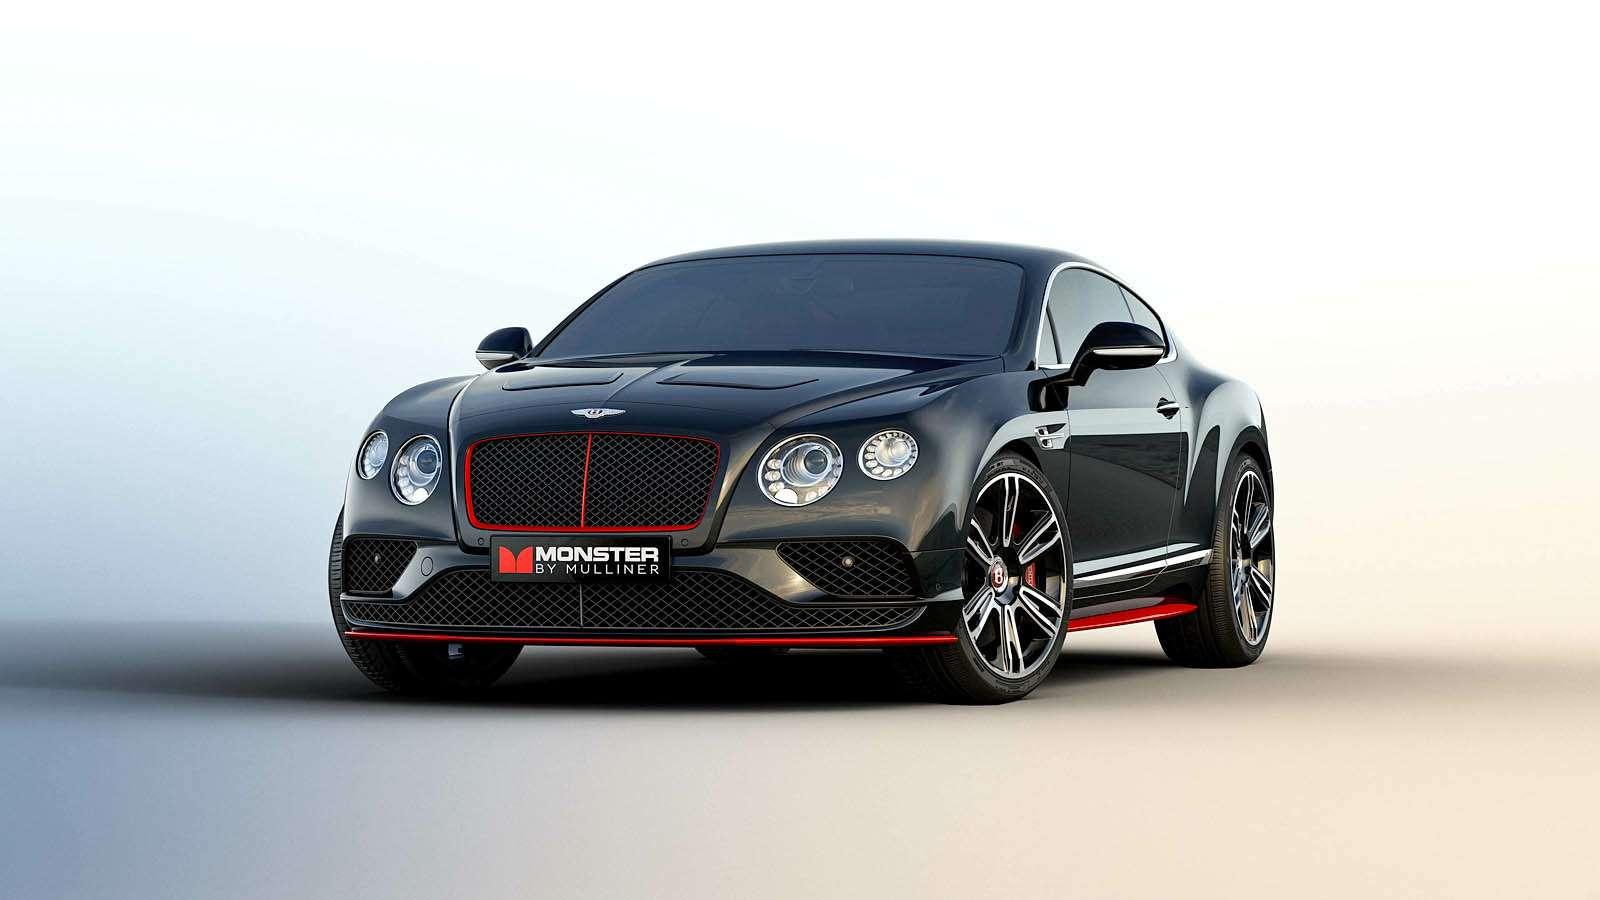 Bentley Continental GTMonster byMulliner